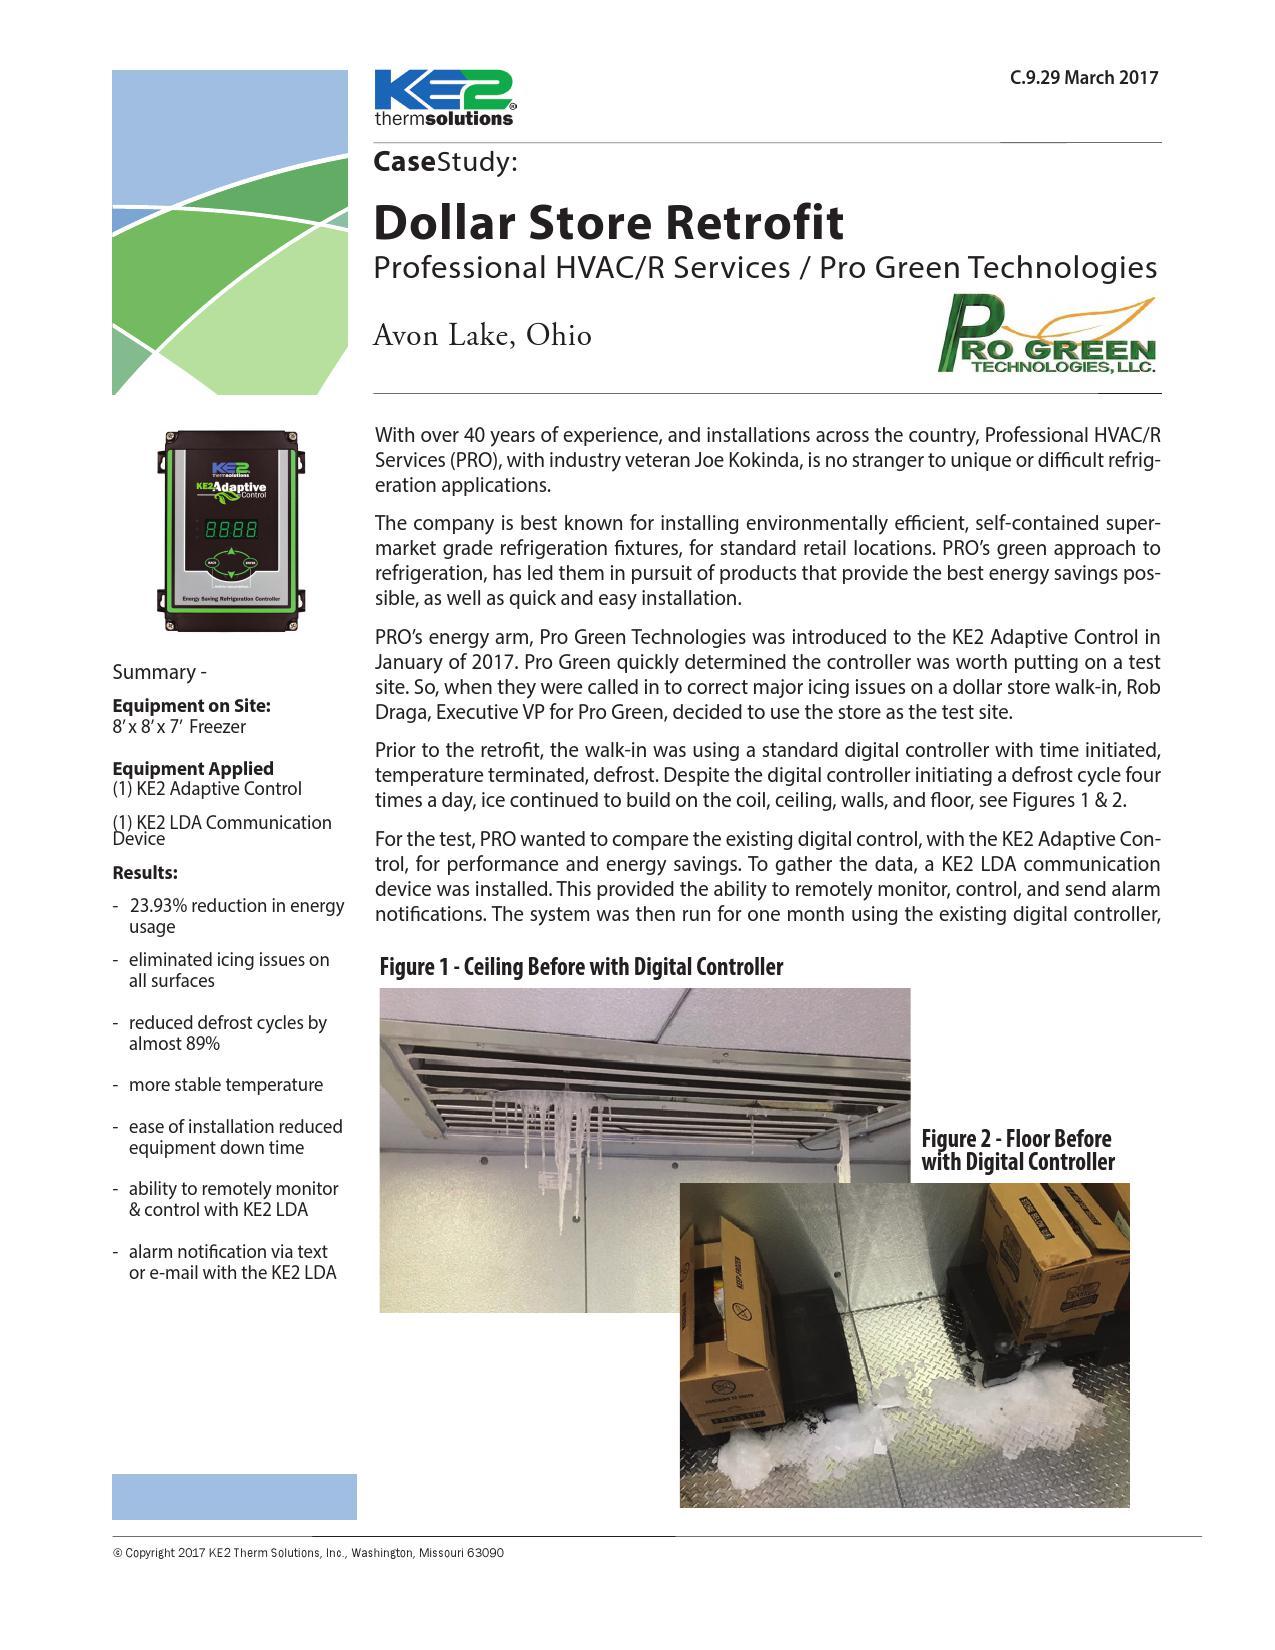 Case Study: Dollar Store Retrofit